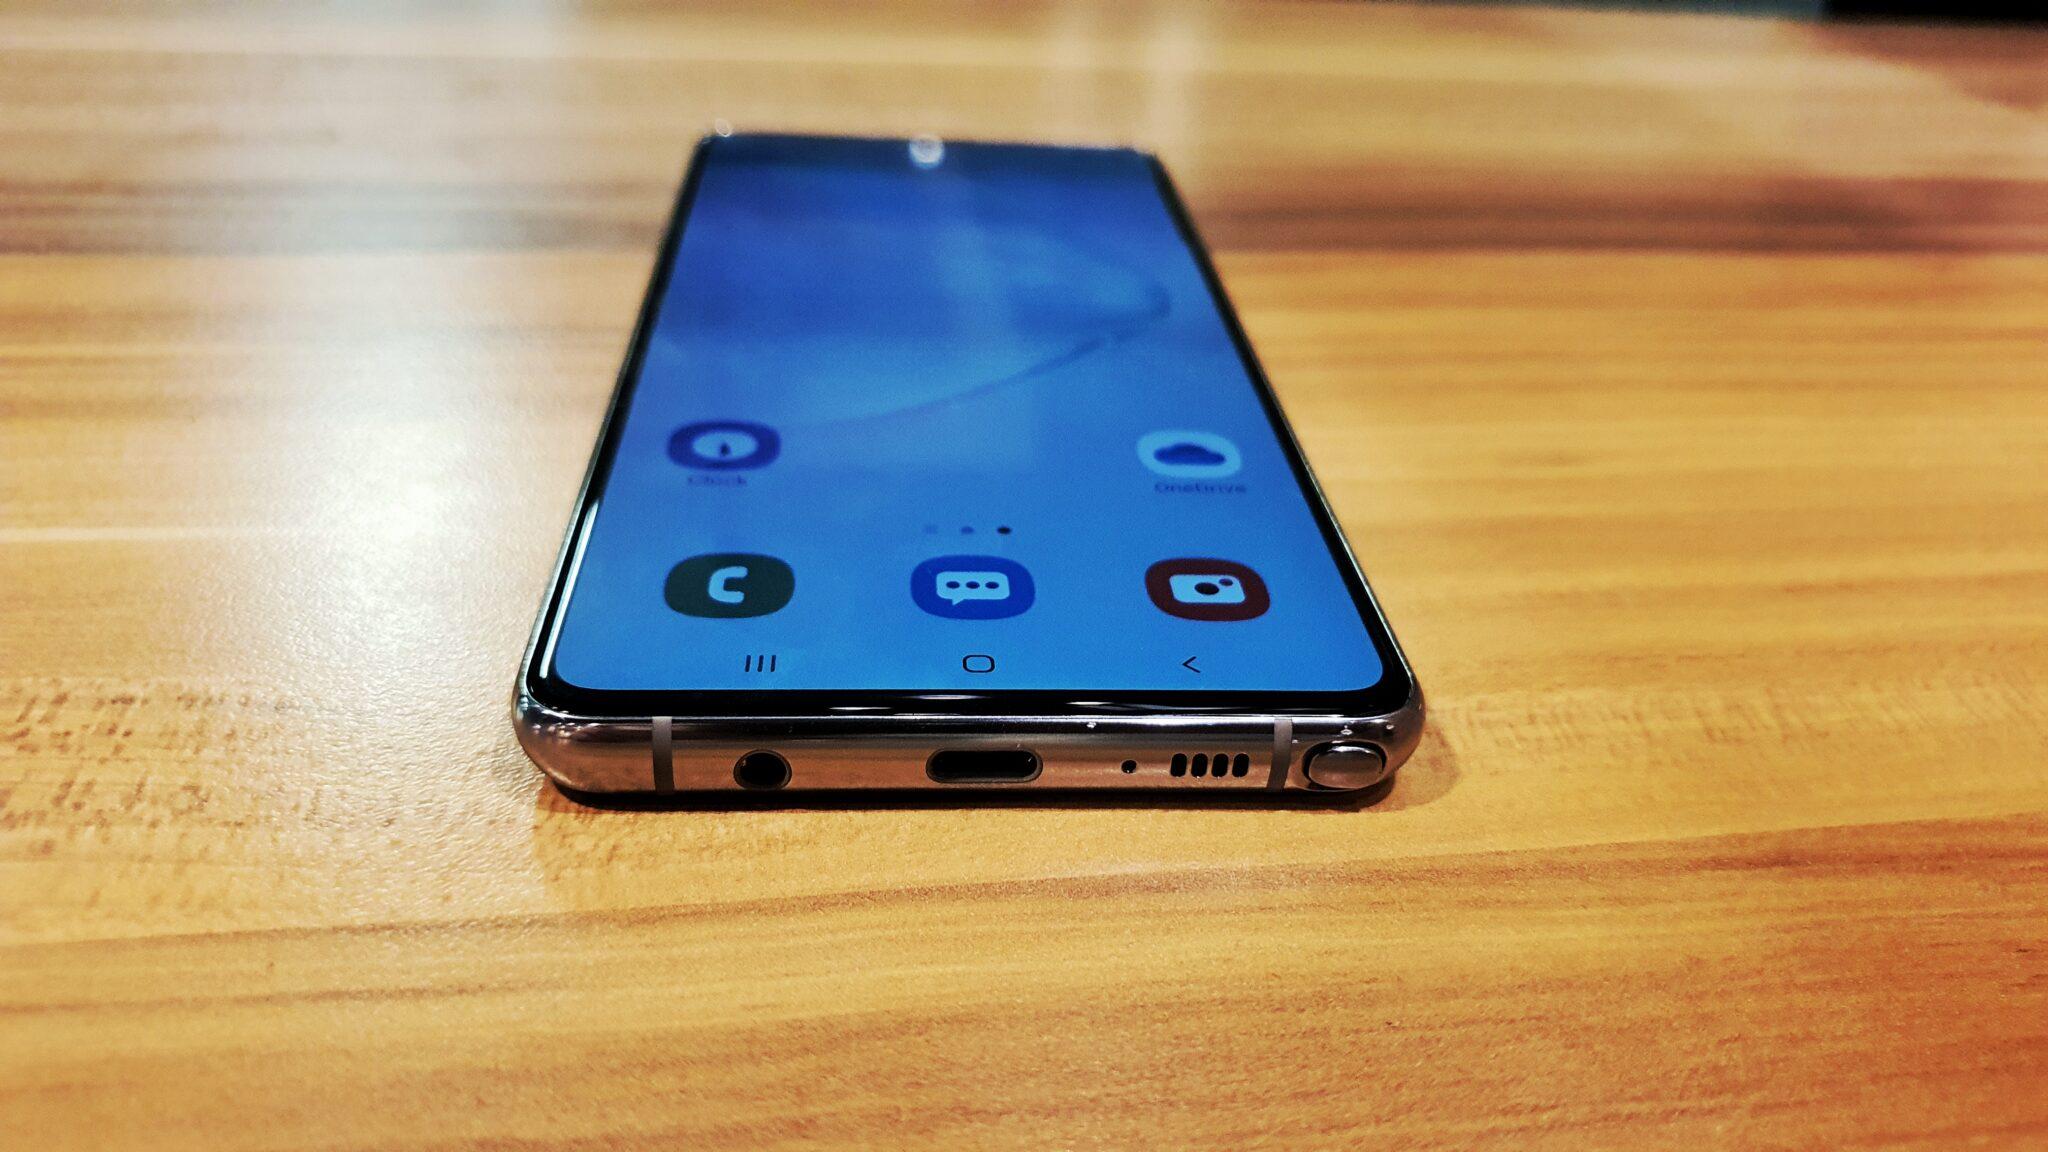 Galaxy Note10 Lite audio jack